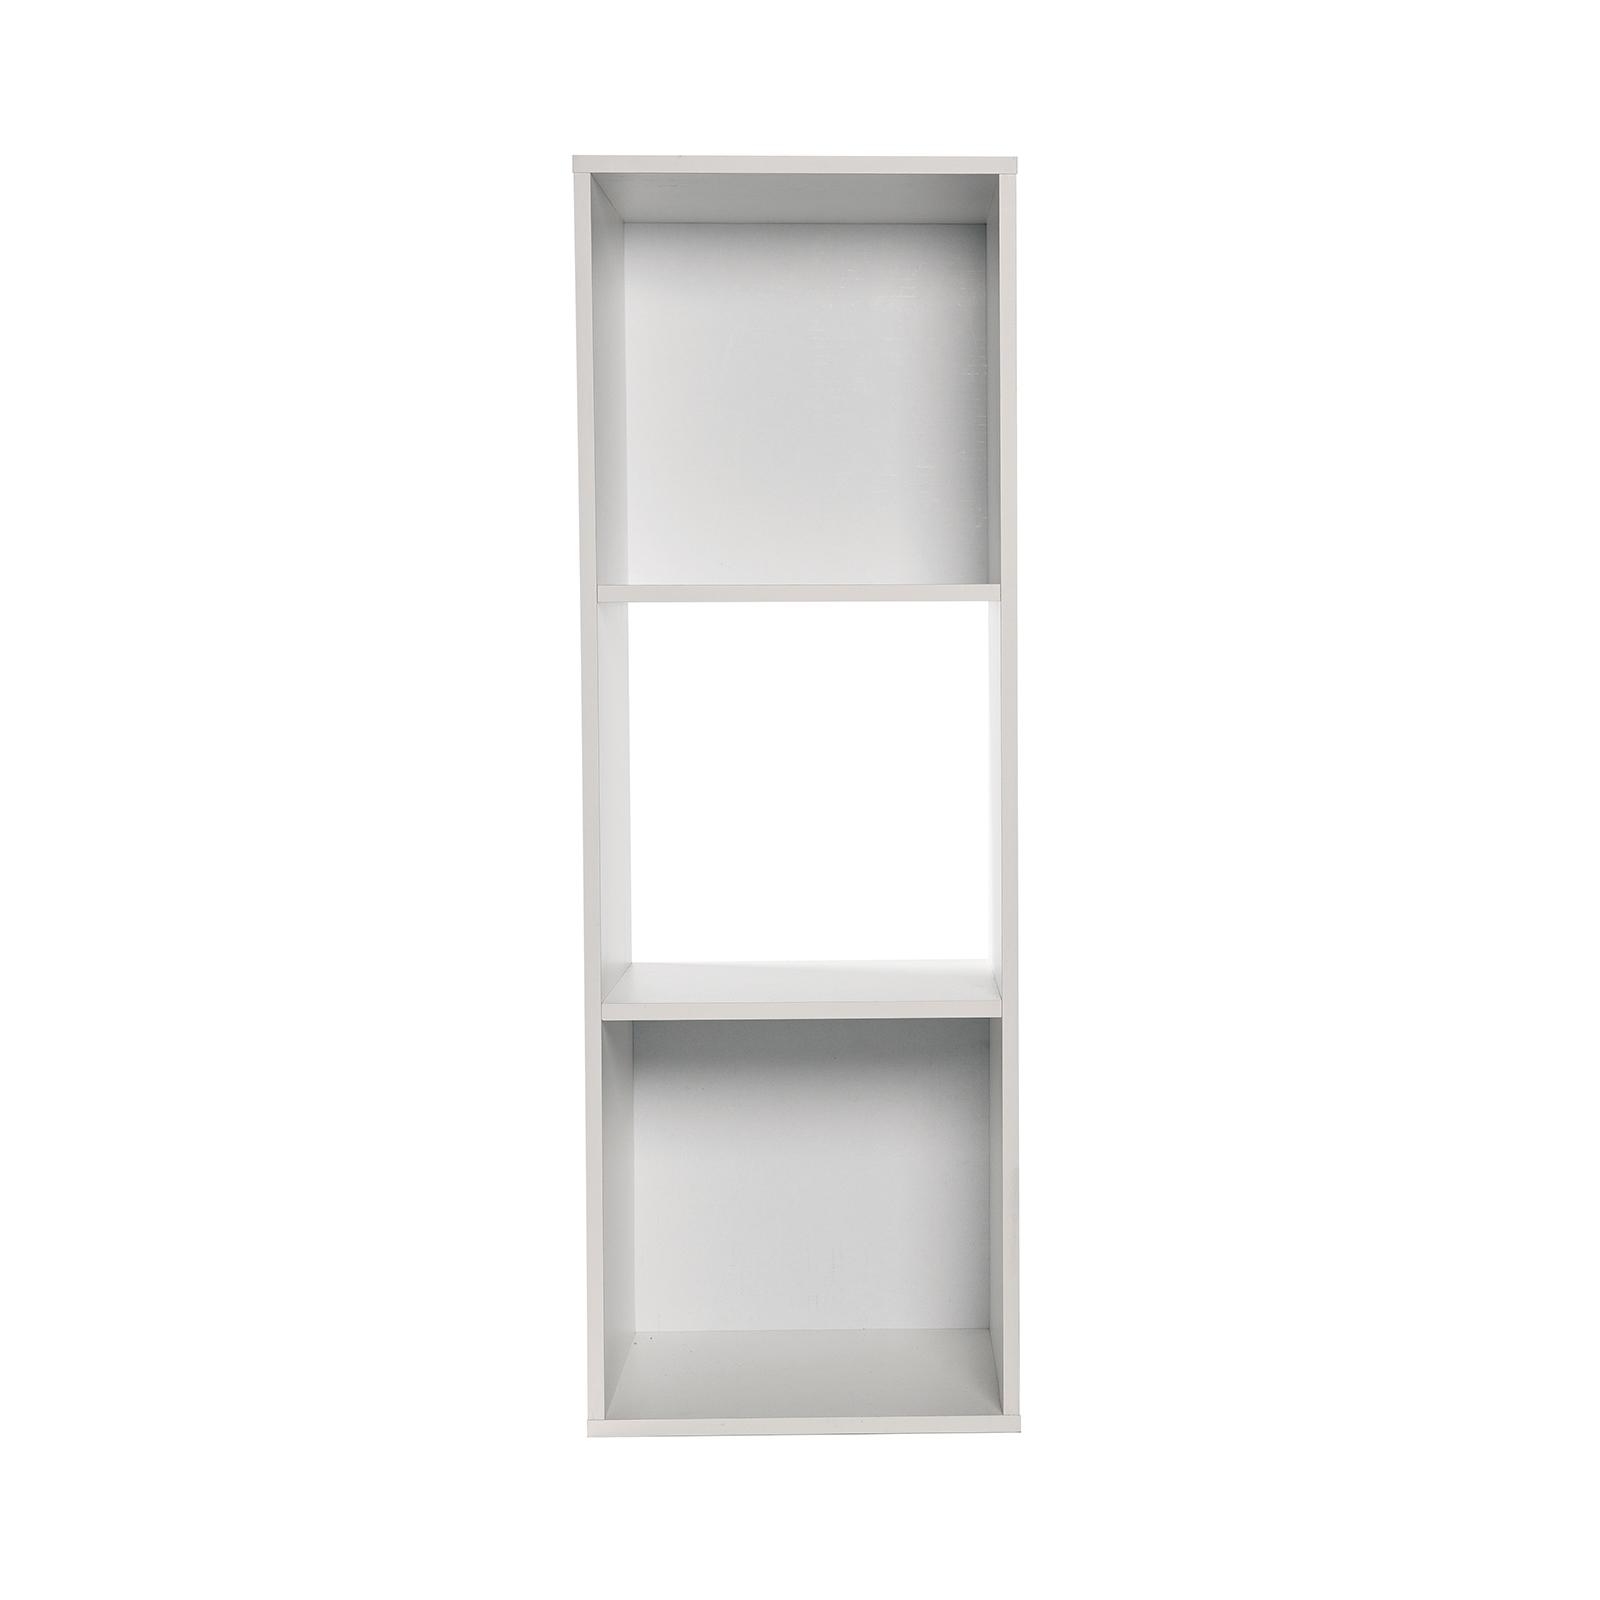 Flexi Storage Clever Cube 1 x 3 White Compact Storage Unit